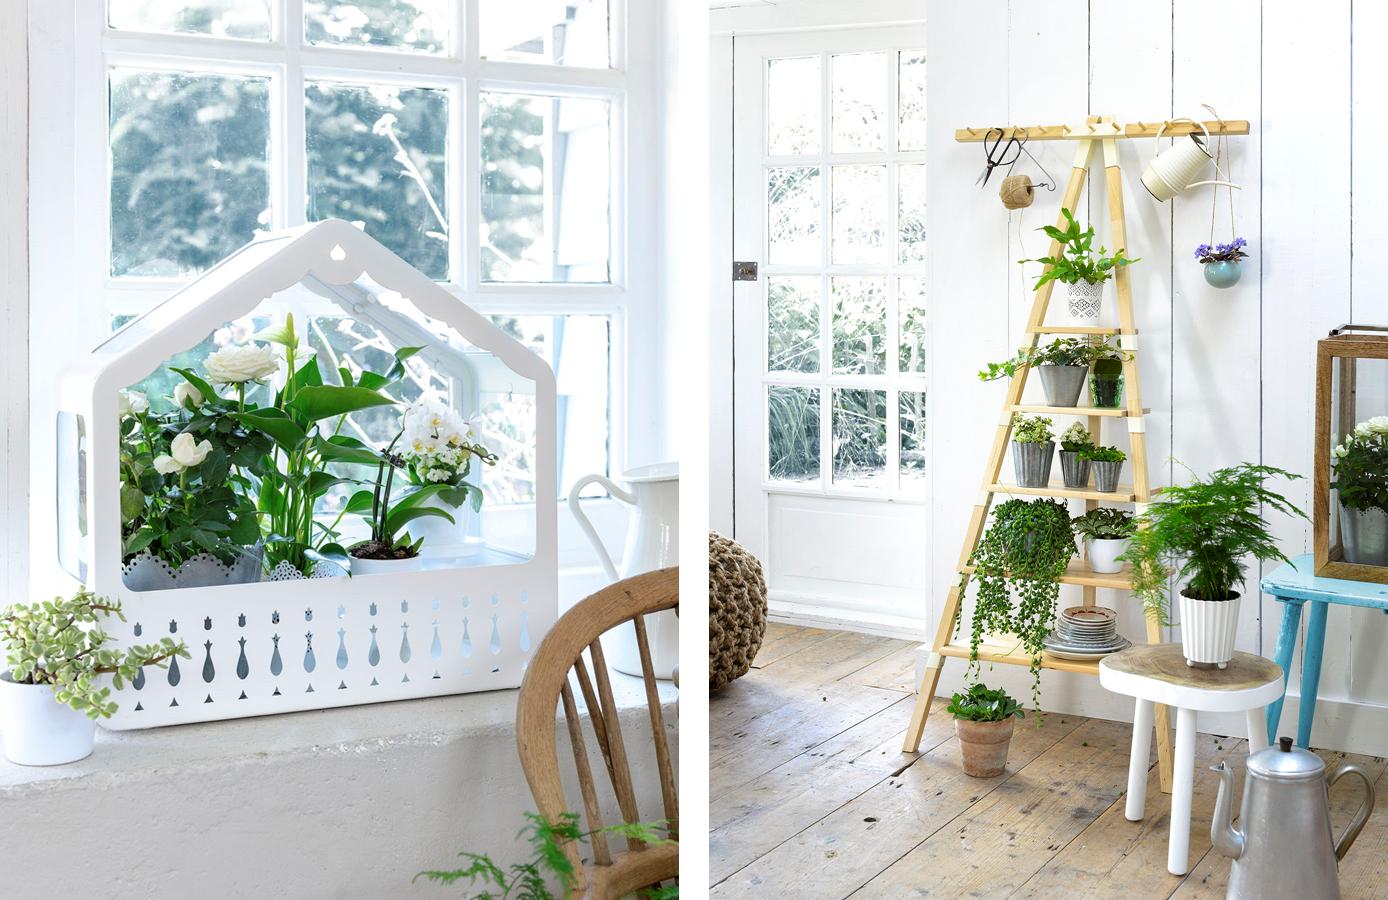 Decoraci n f cil plantas imprescindibles en el hogar - Escalera decoracion ikea ...